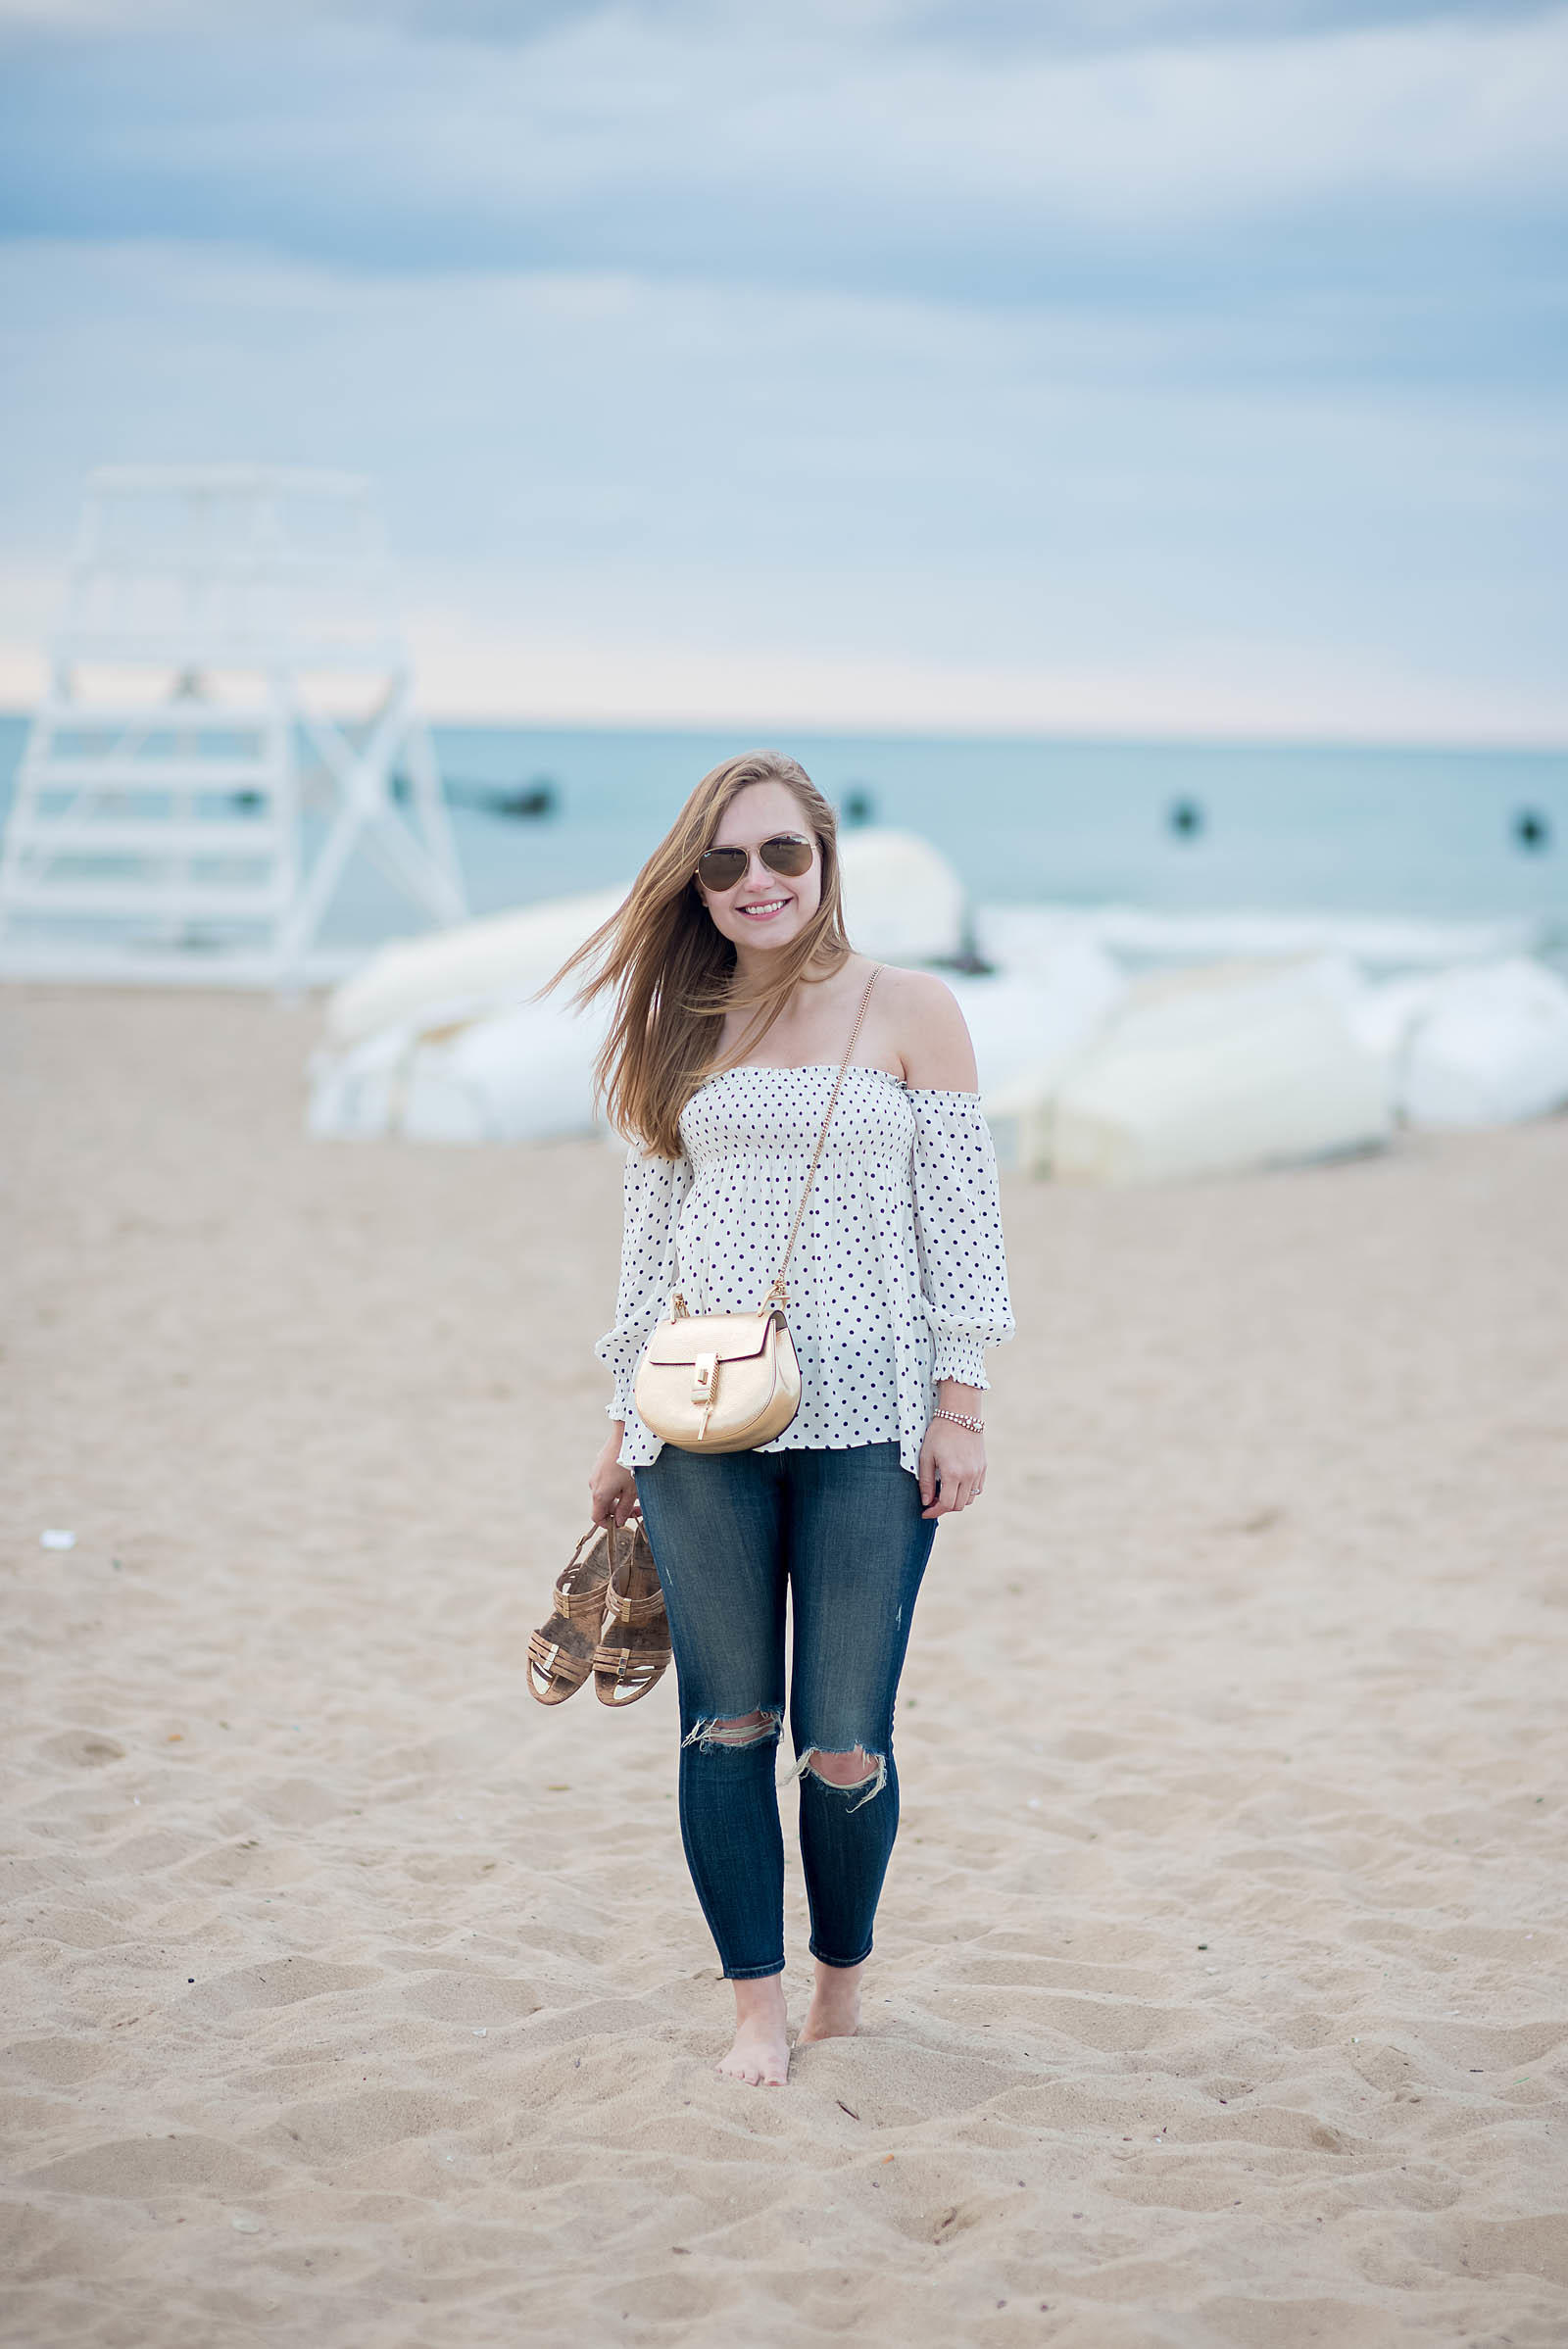 Summer Jeans Beach Outfit Chloe Drew